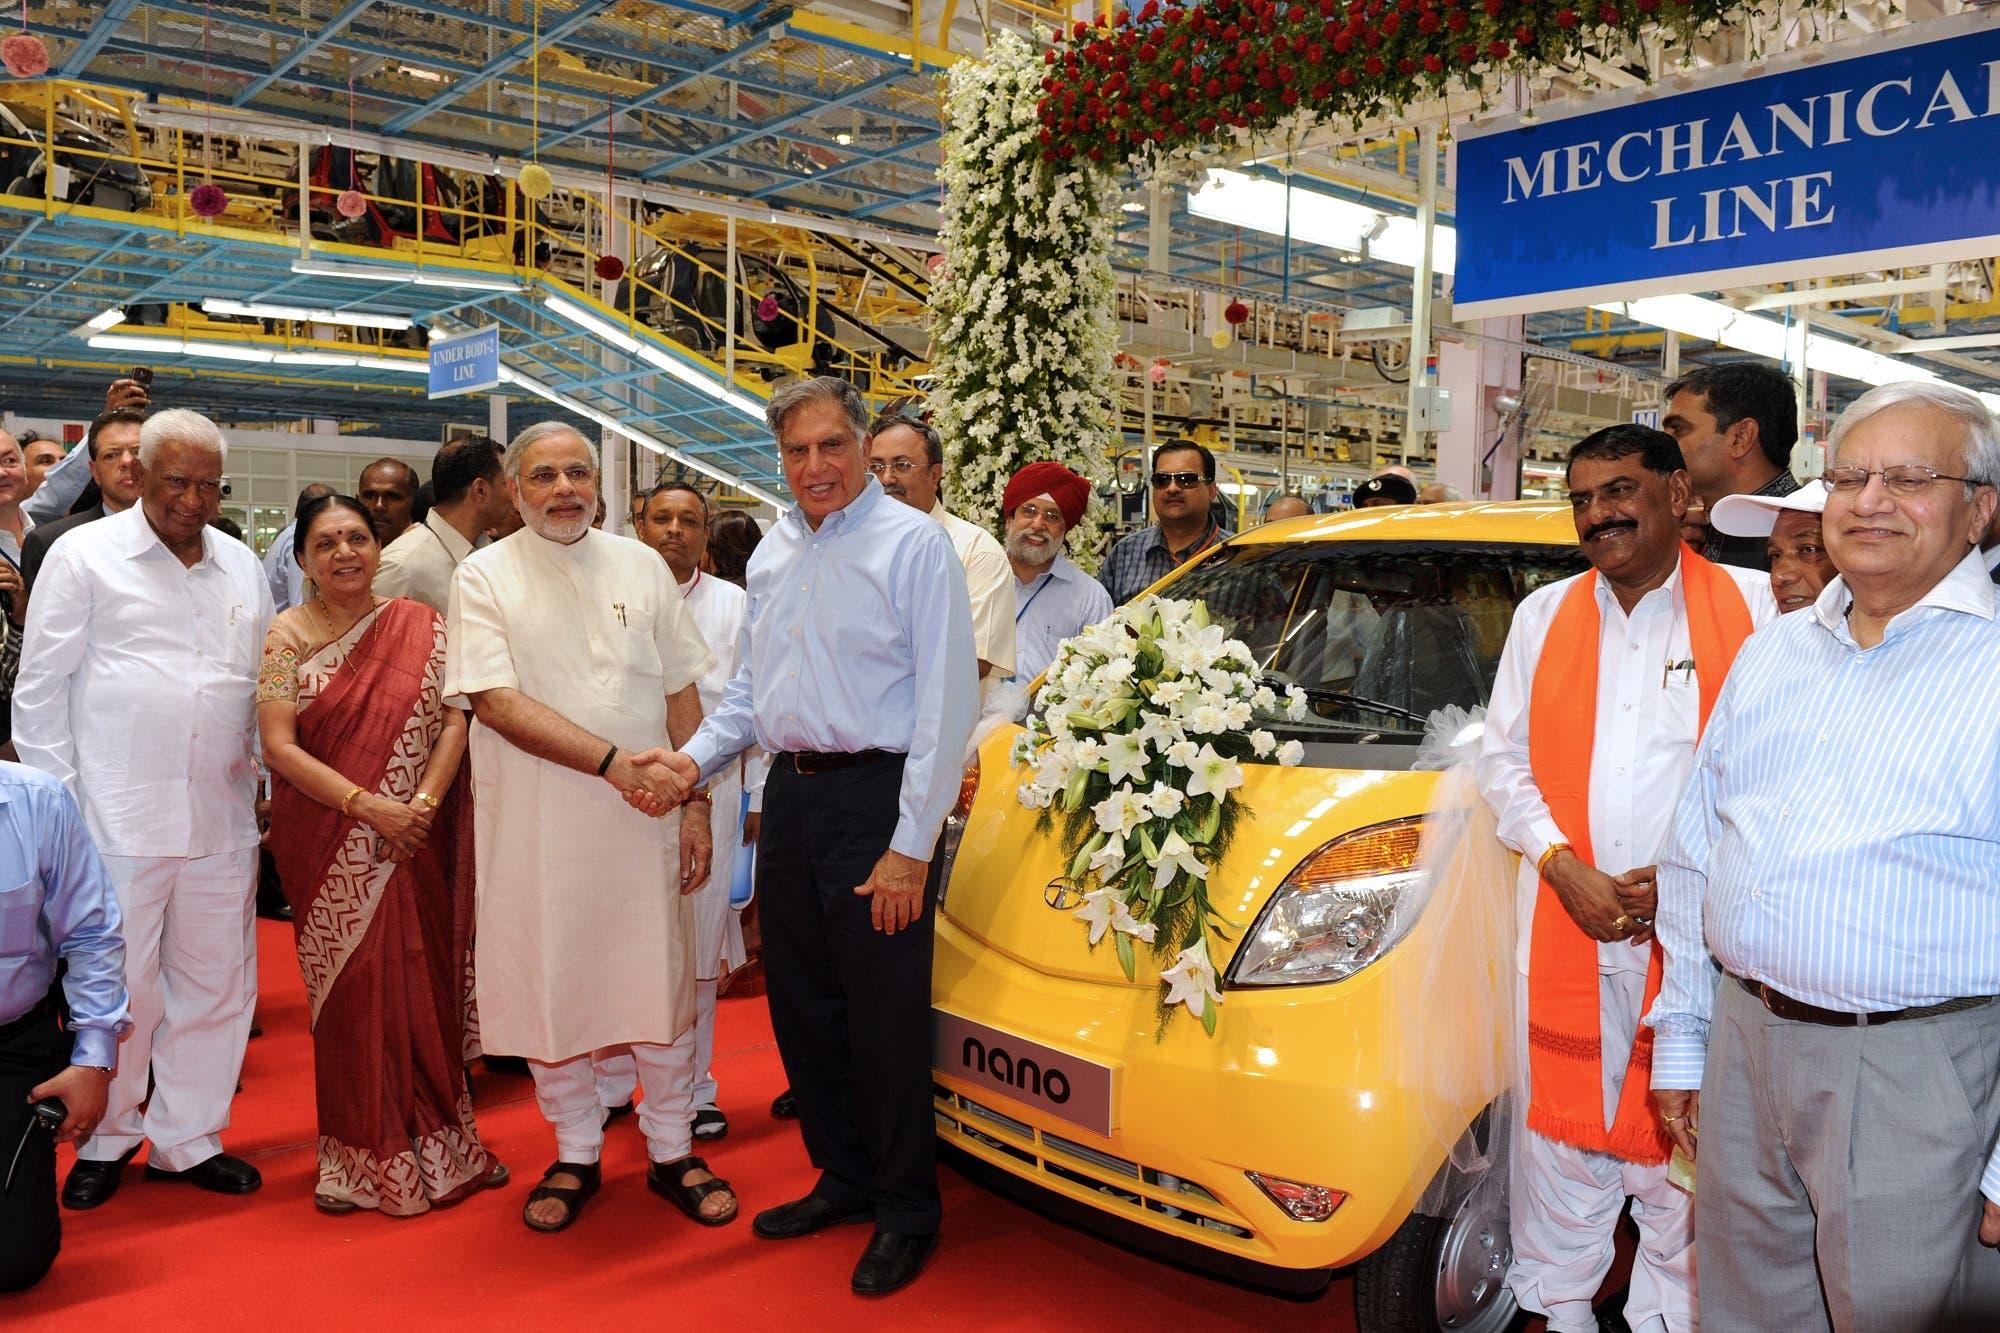 Ratan Tata (C) and then Gujarat Chief Minister Narendra Modi (5th L) pose besides a Nano car at the new Nano plant near Ahmedabad on June 2, 2010. (AFP)